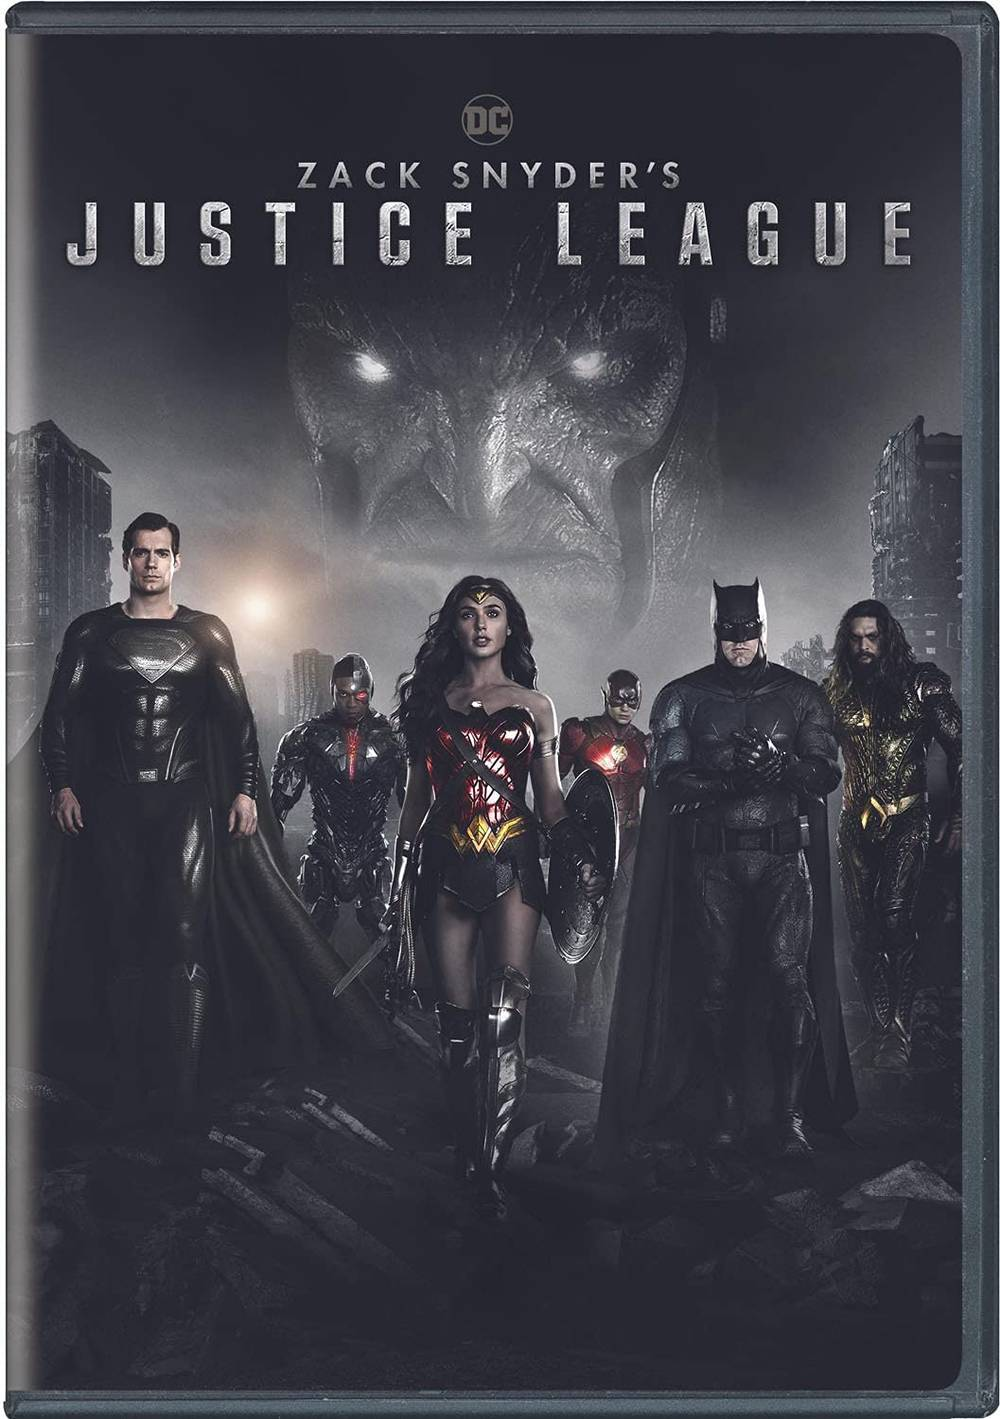 Justice League [Movie] - Zack Snyder's Justice League